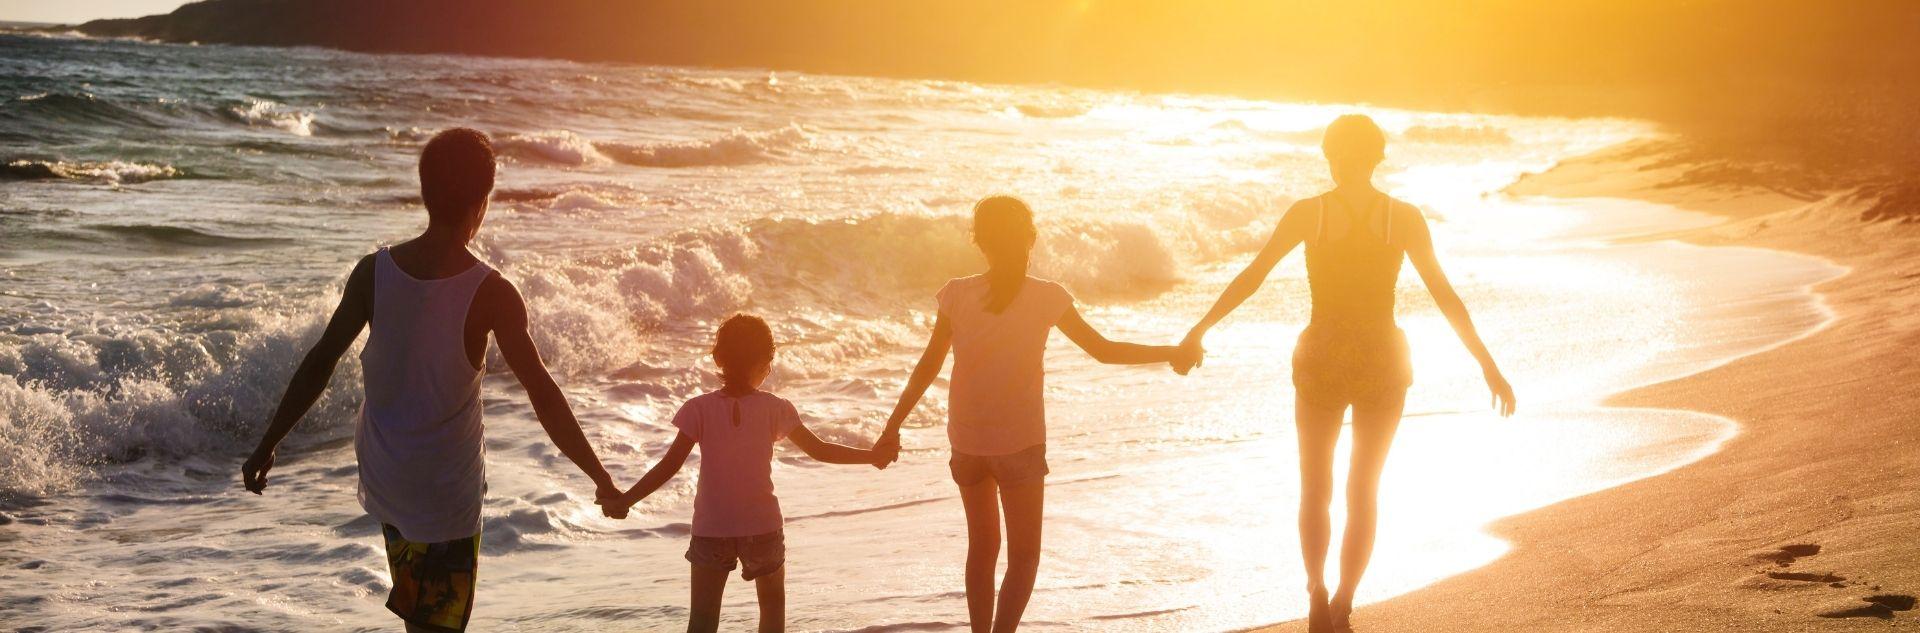 Strandspiel Hero - Sonnenuntergang Familie